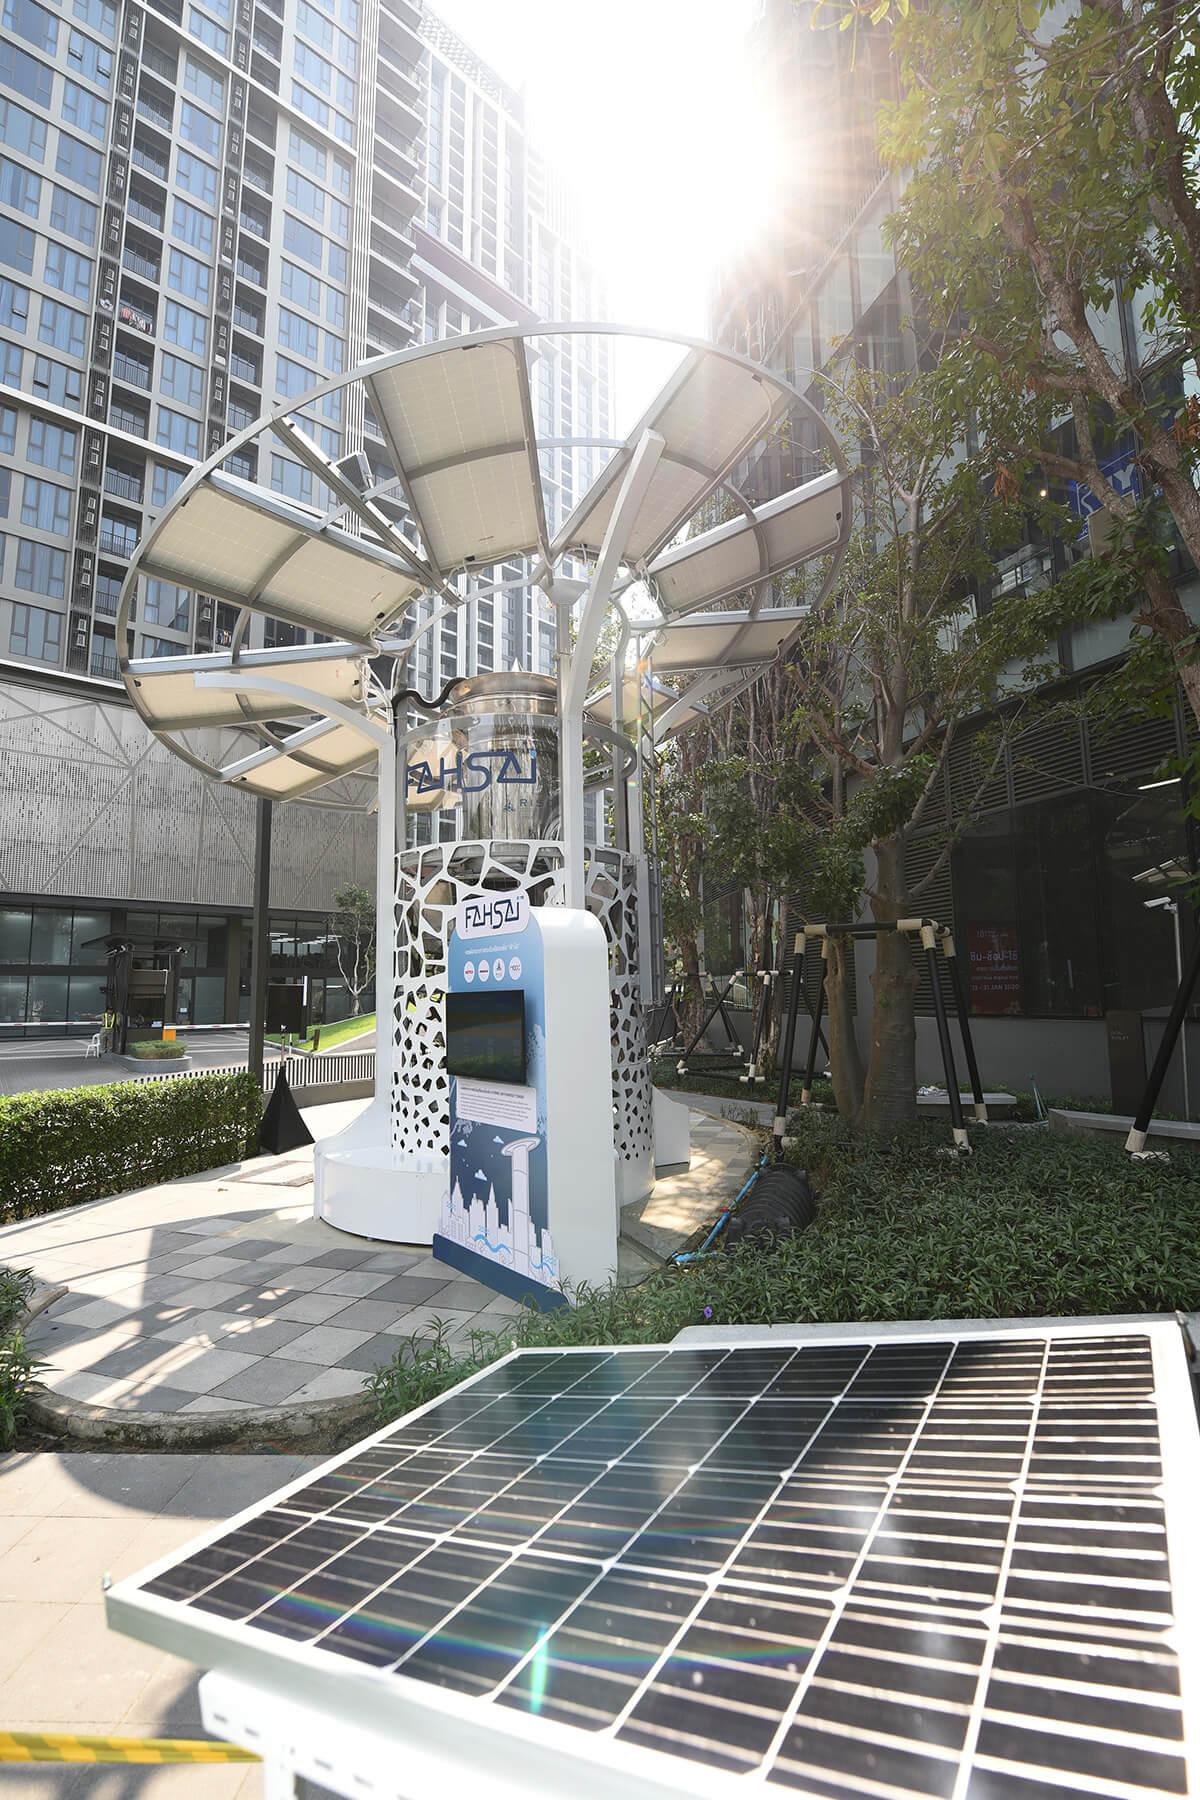 "RISC โดย MQDC นำร่องอสังหาฯ รายแรกของไทย เปิดตัวต้นแบบหอฟอกอากาศระดับเมือง ""ฟ้าใส"" ตอกย้ำแนวคิด 'for all well-being' 14 - 101 True Digital Park"